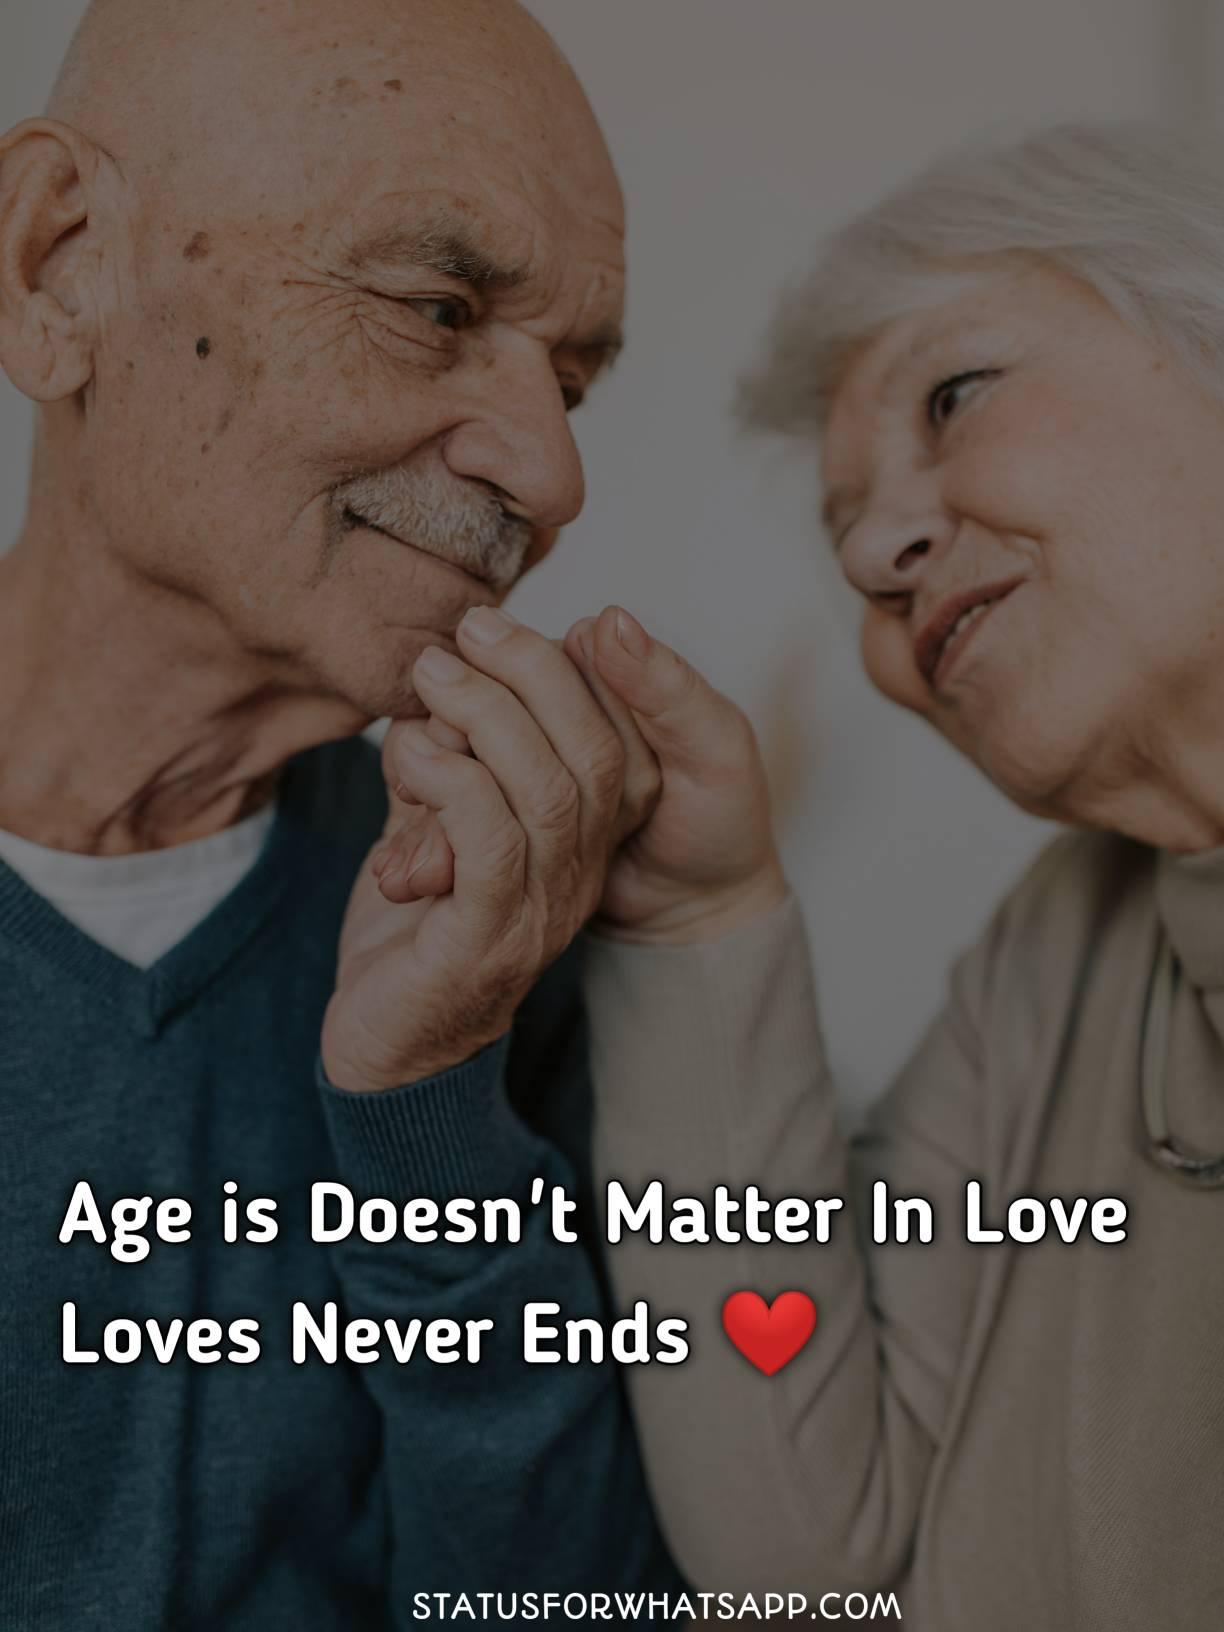 Lovea Never Ends